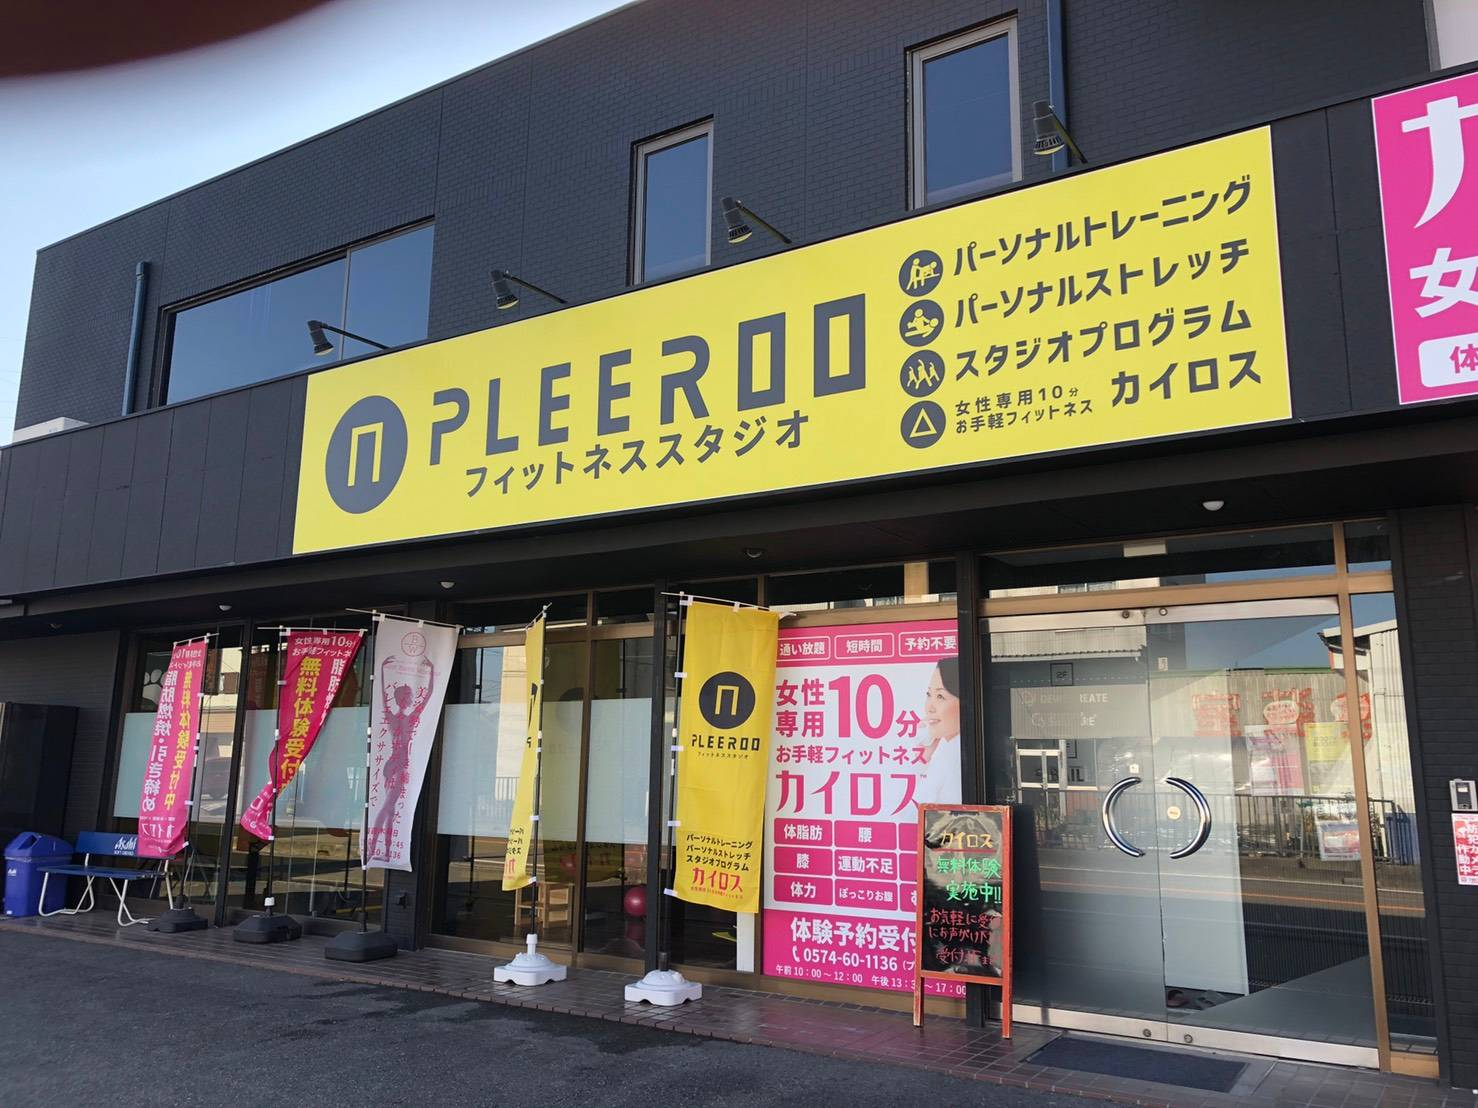 PLEEROOフィットネススタジオ